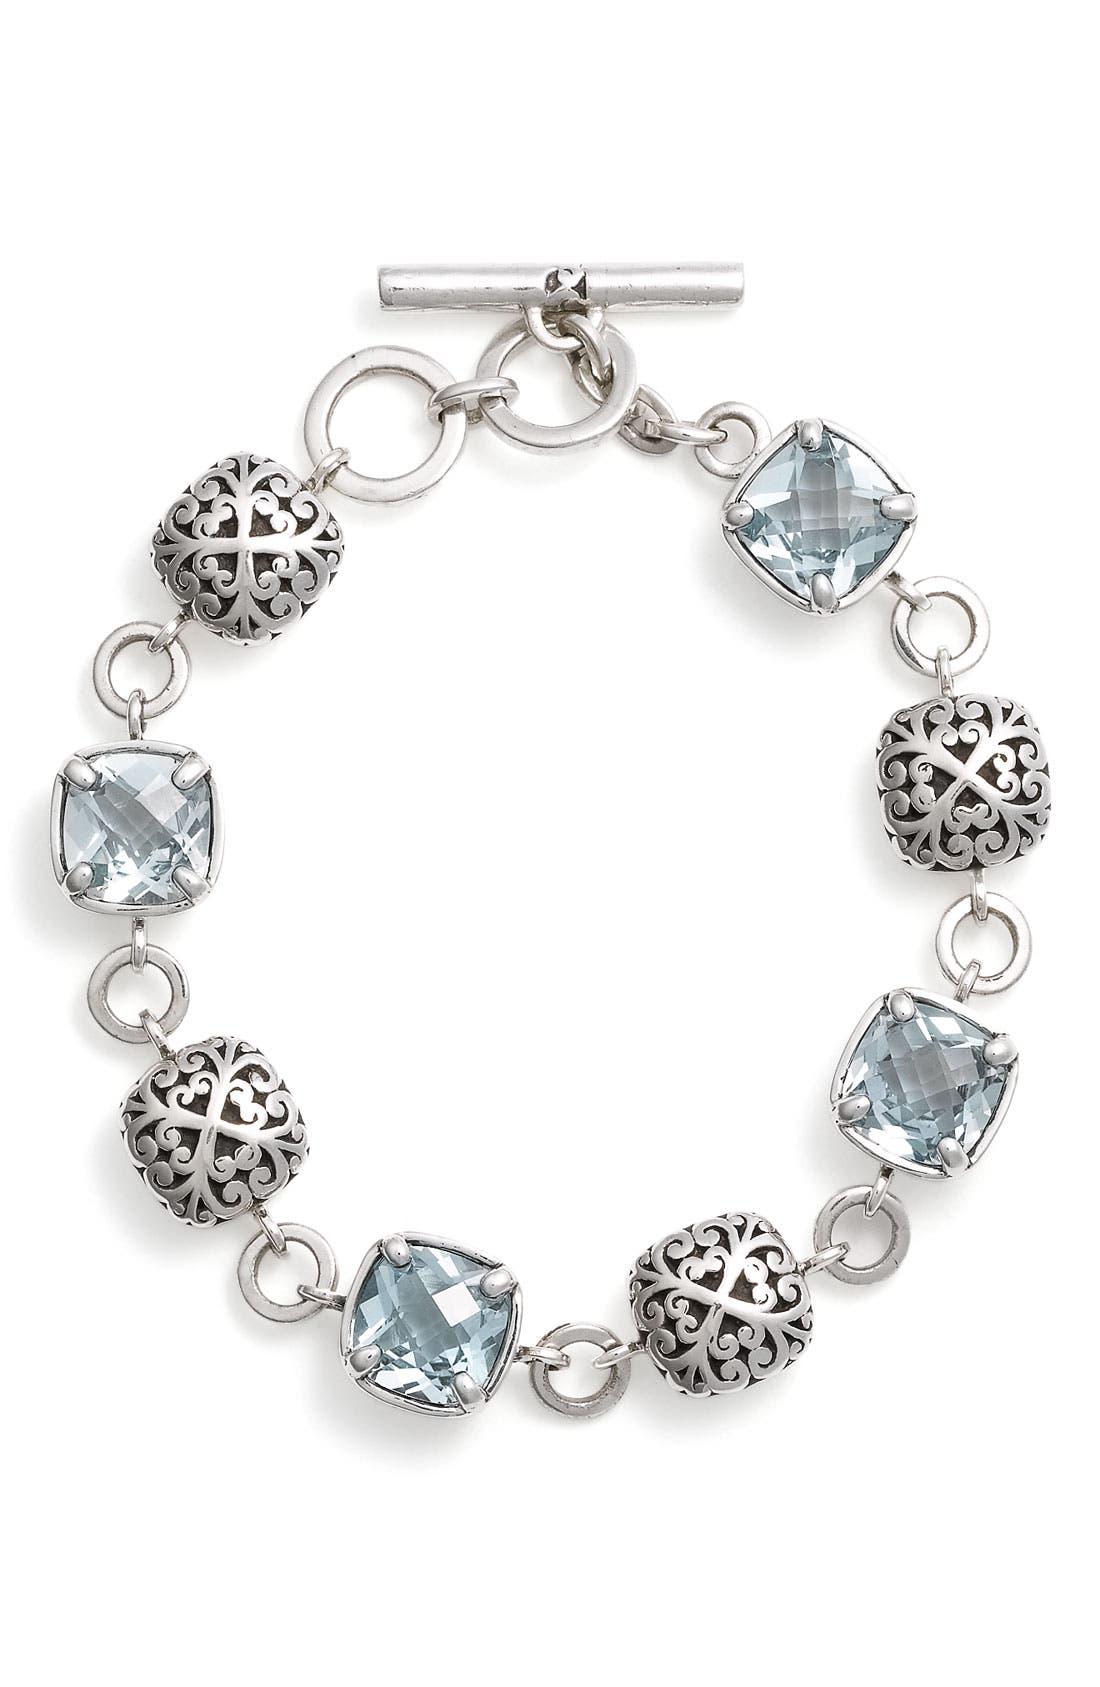 Main Image - Lois Hill 'Sky Blue Topaz' Toggle Bracelet